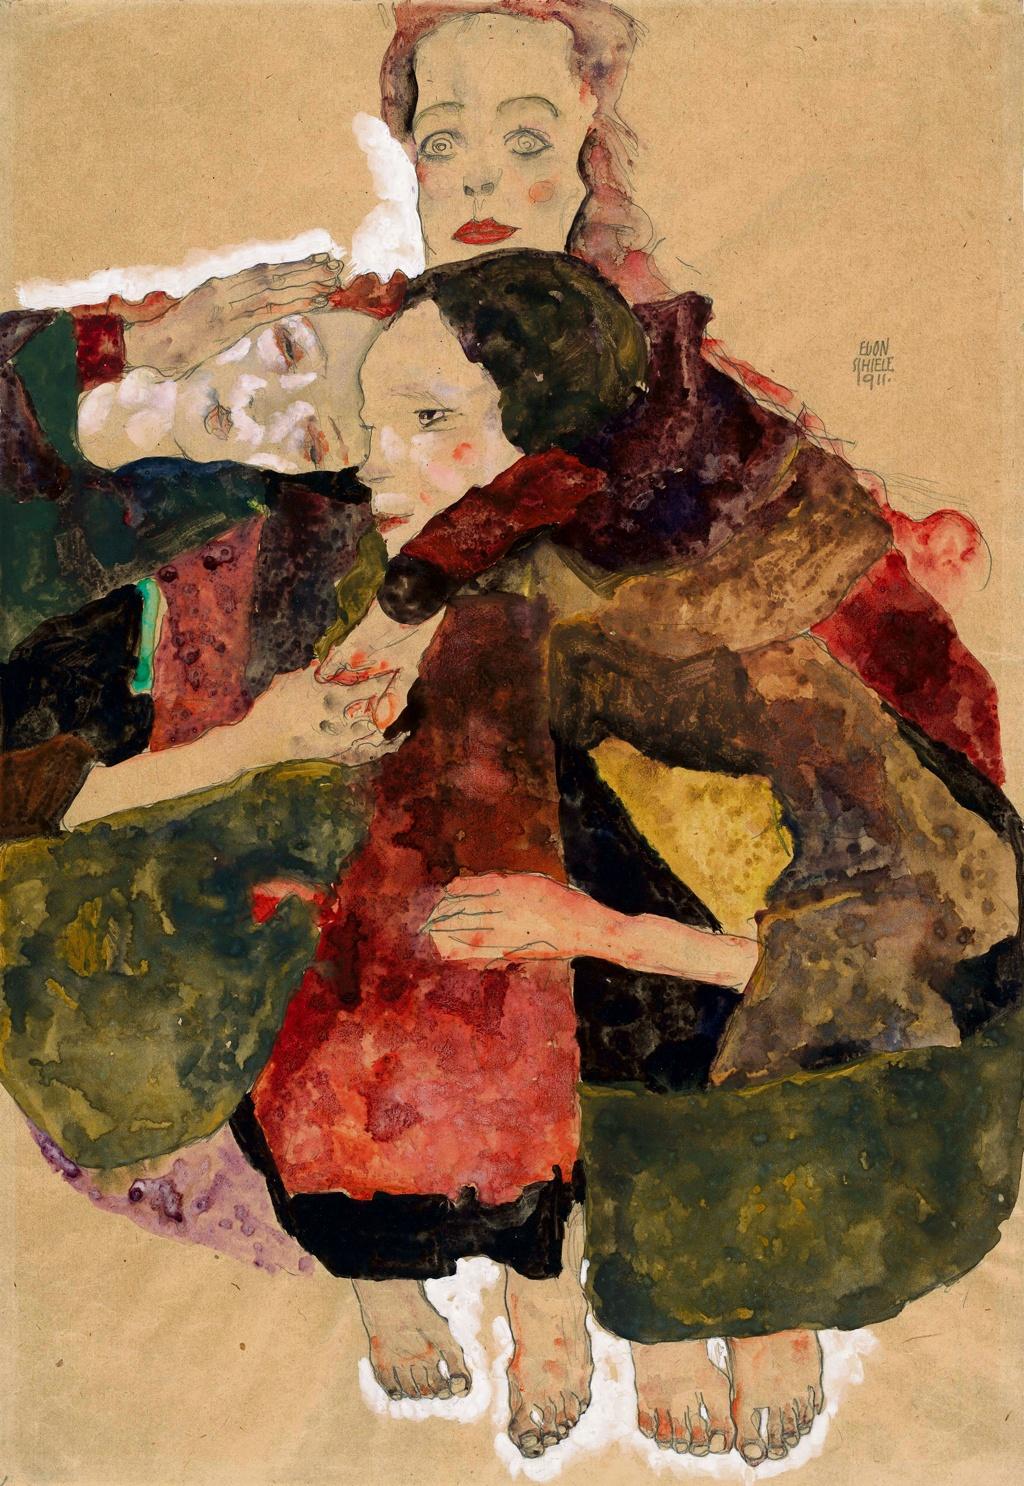 Egon Schiele, Group of Three Girls, 1911